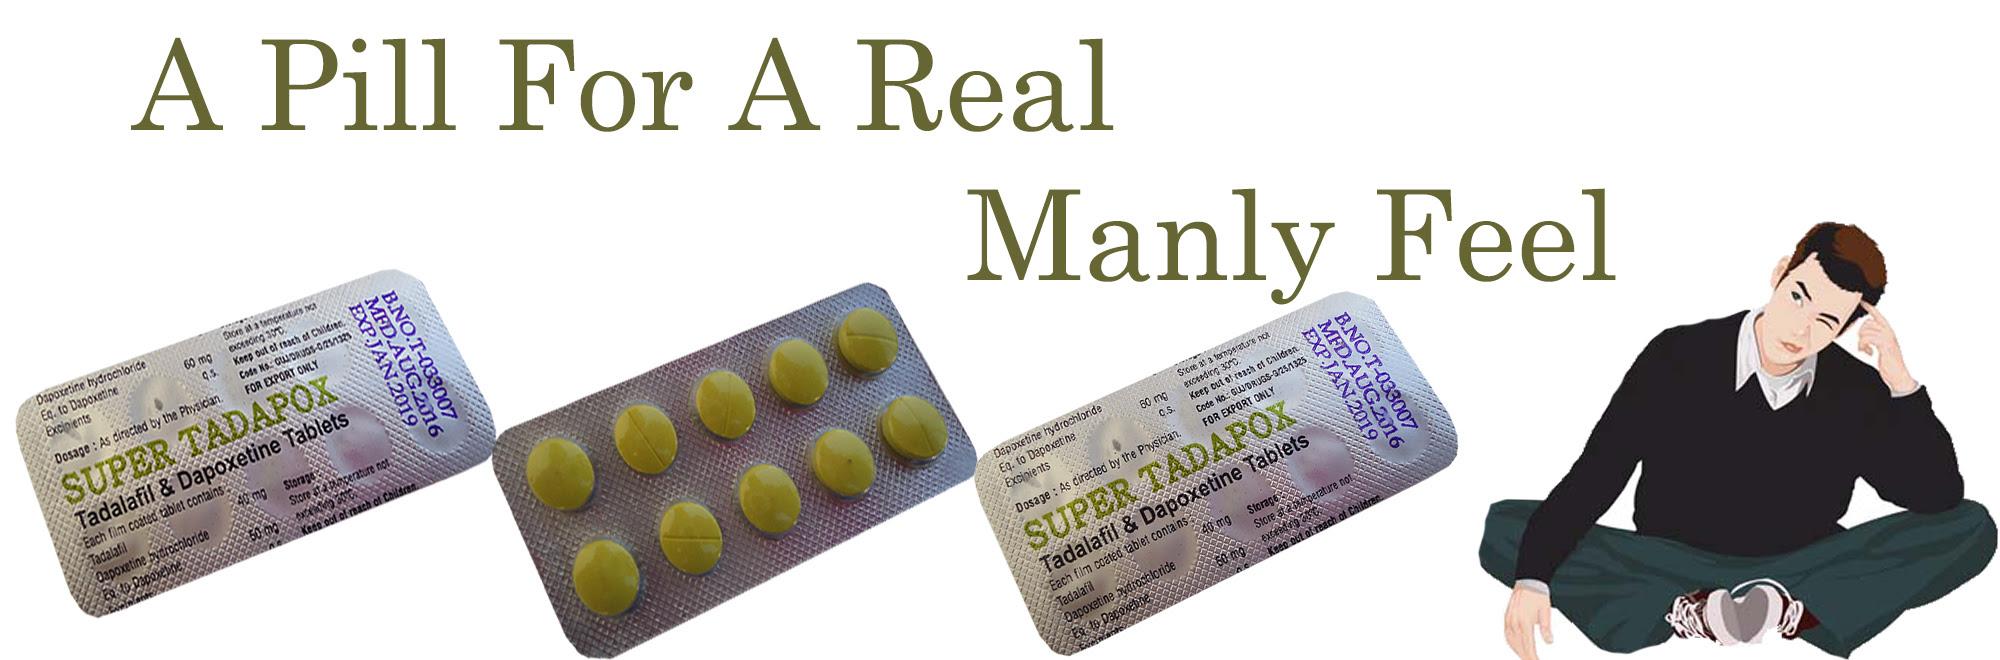 Pharma Himalaya Liv 52 Drops In Hindi Hyaluronic Acid Serum Usage Cytotec Price In Qatar Avanafil 200 Mg Preis